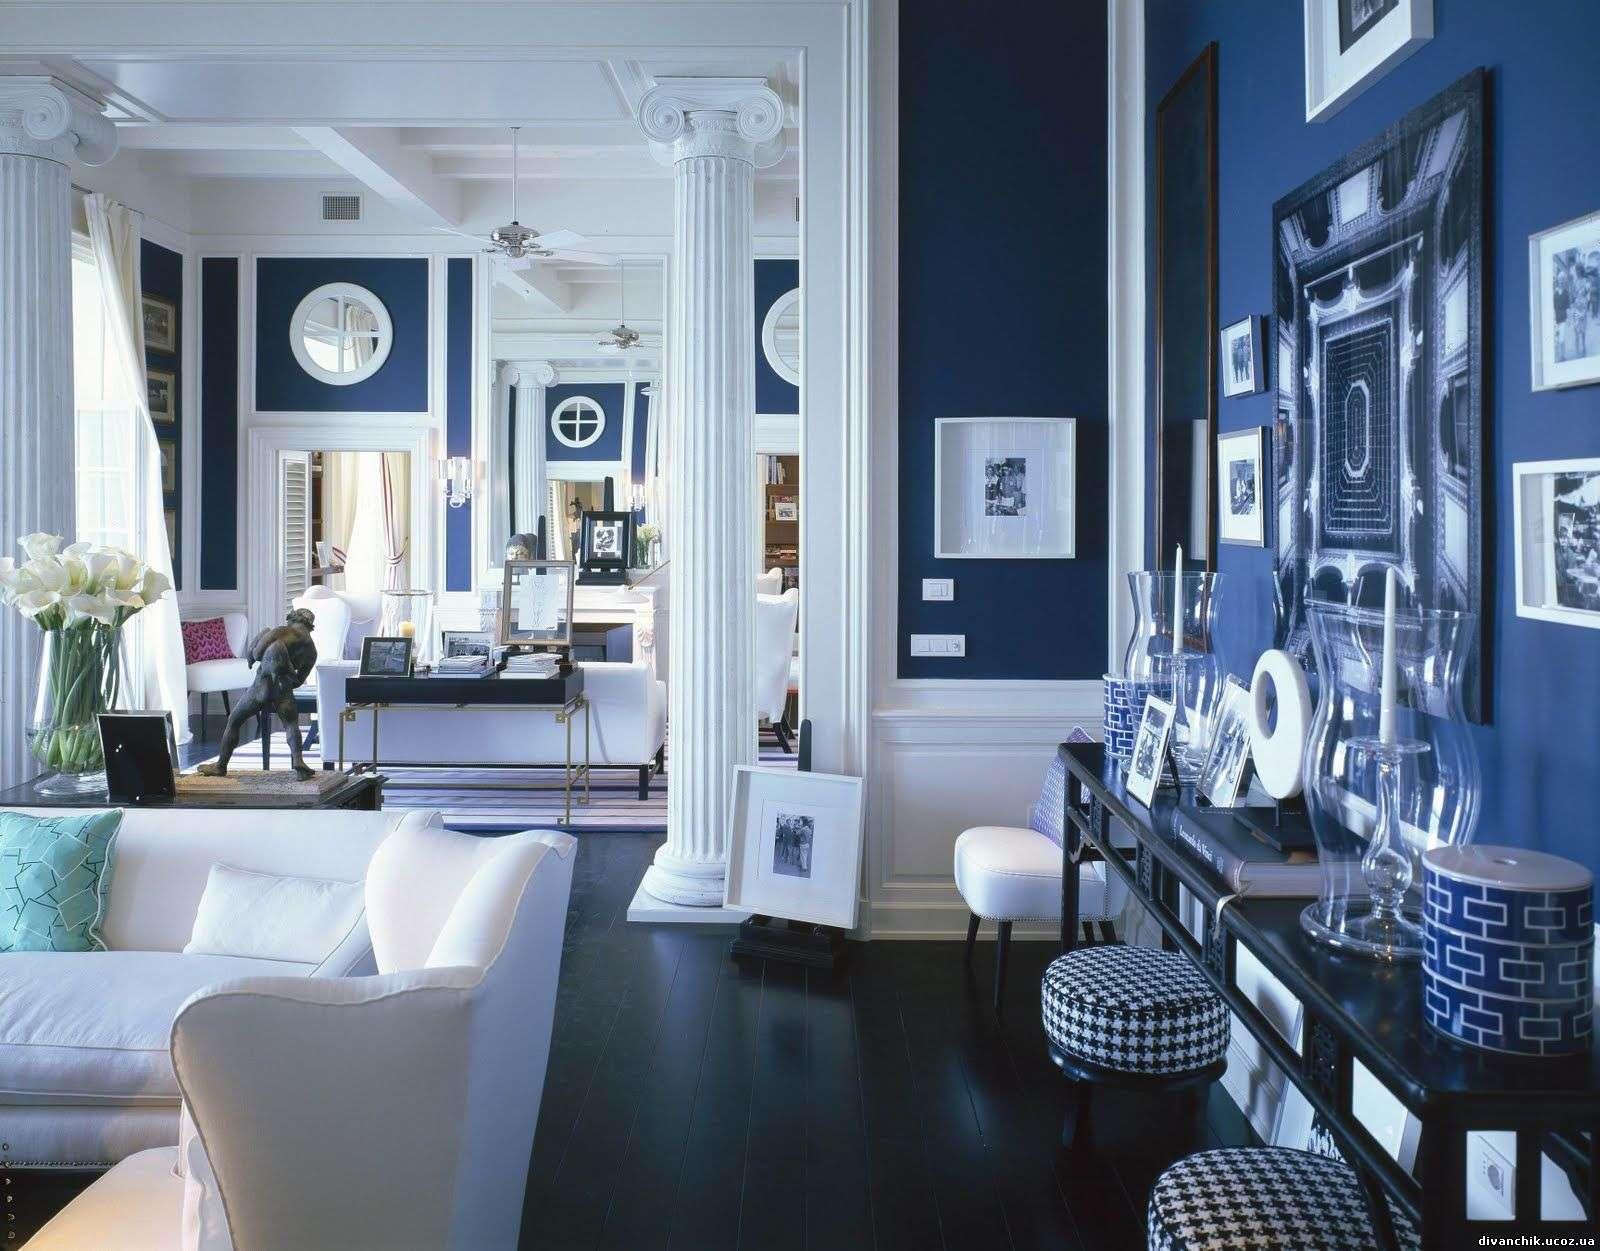 Other Design Inspiring Large Open Navy Blue Bedroom White Wing